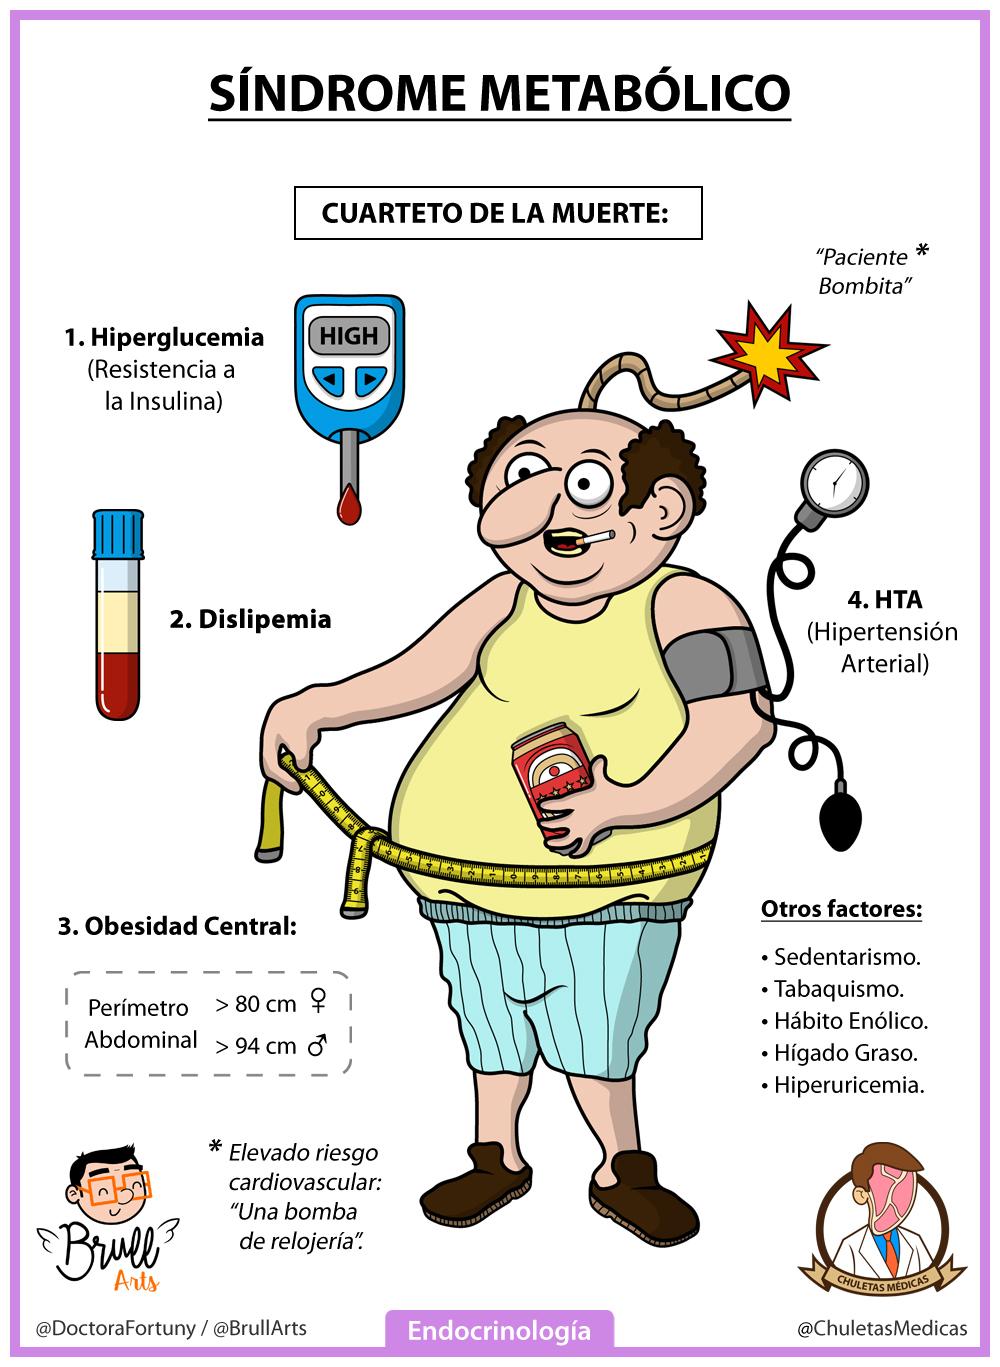 Síndrome Metabólico: Conceptos esenciales Chuleta Brull Arts